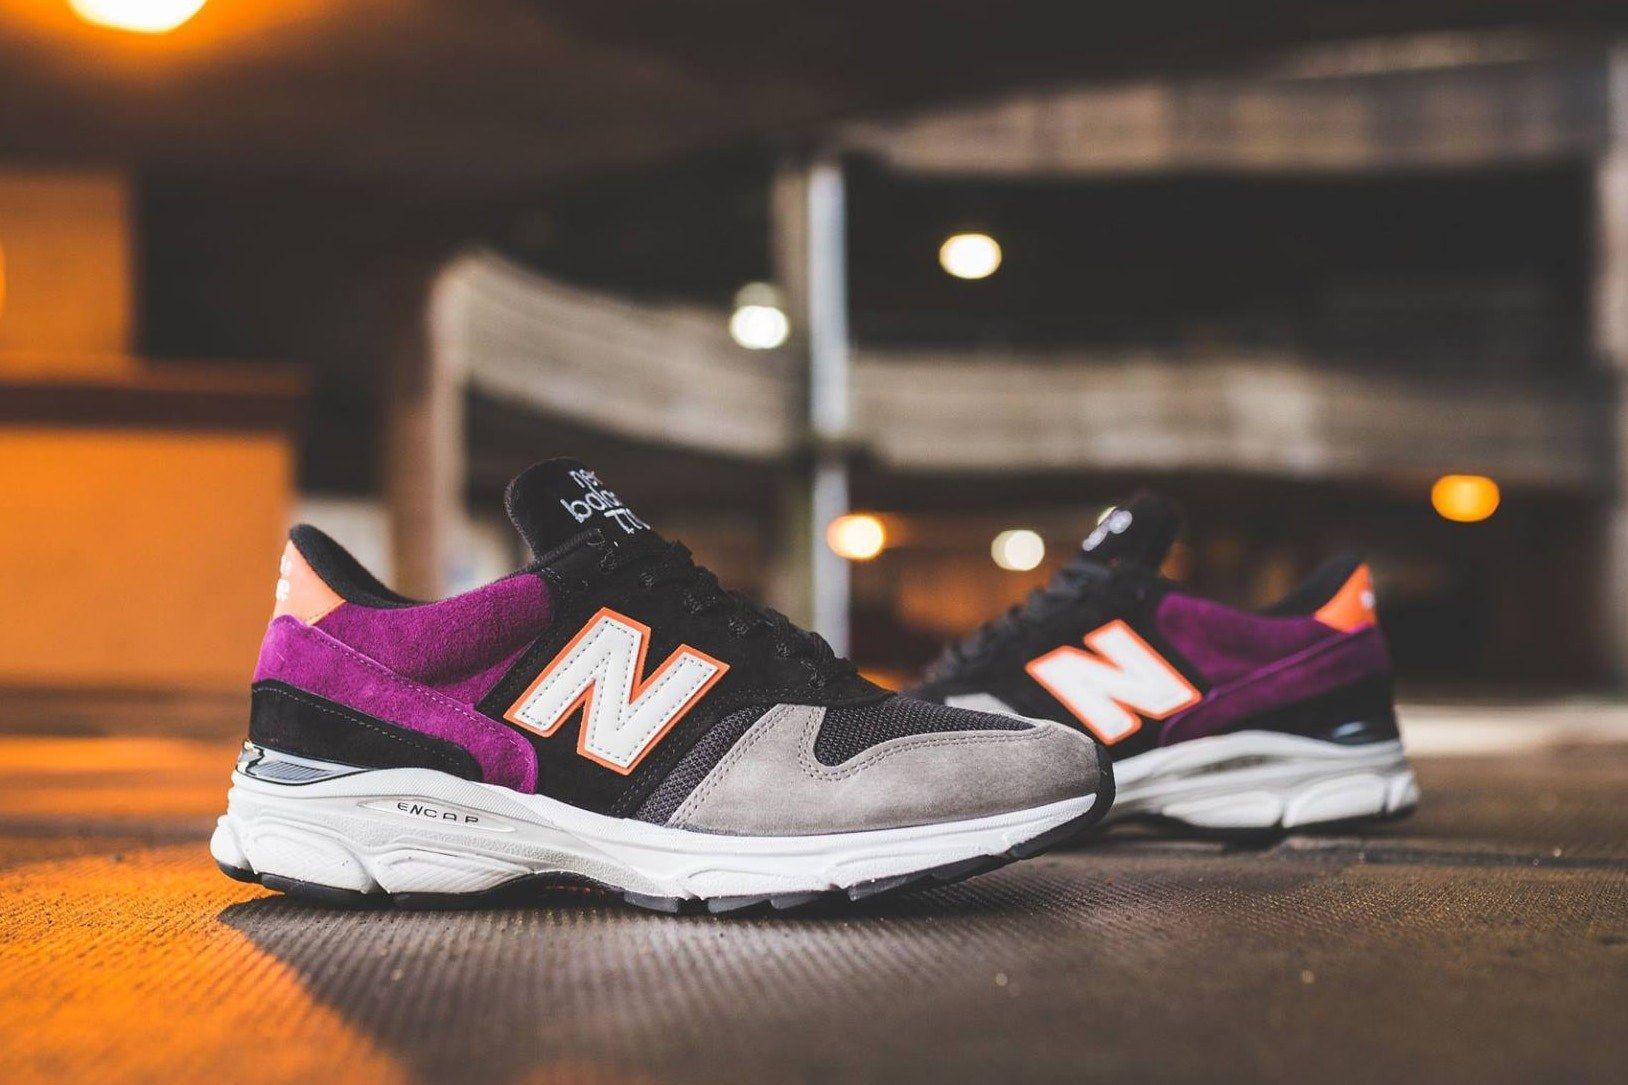 New Balance 9 Pack 770